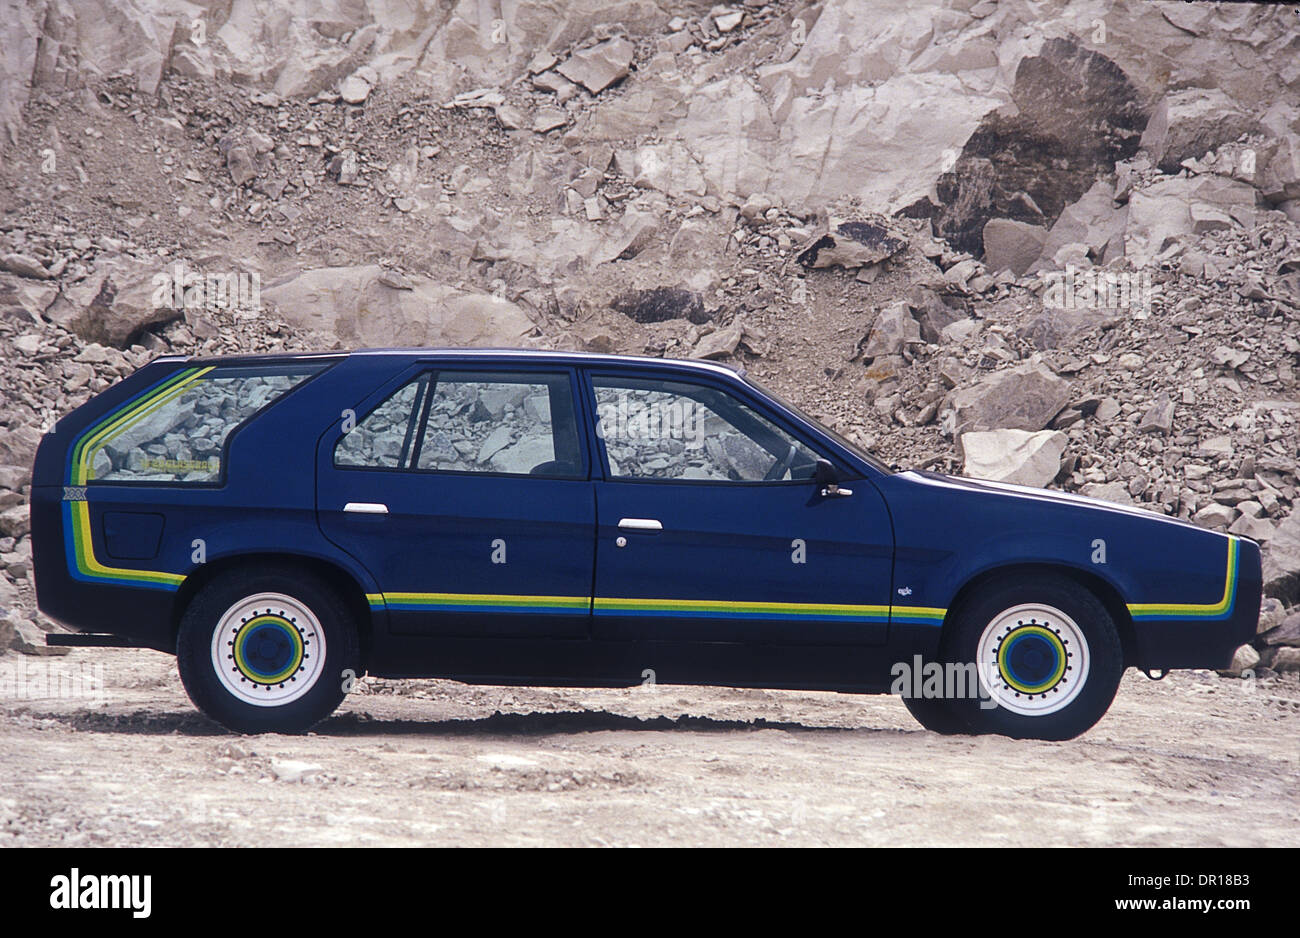 Ogle Design Triplex Glassback 10/20 show car British Leyland Princess 1978 - Stock Image